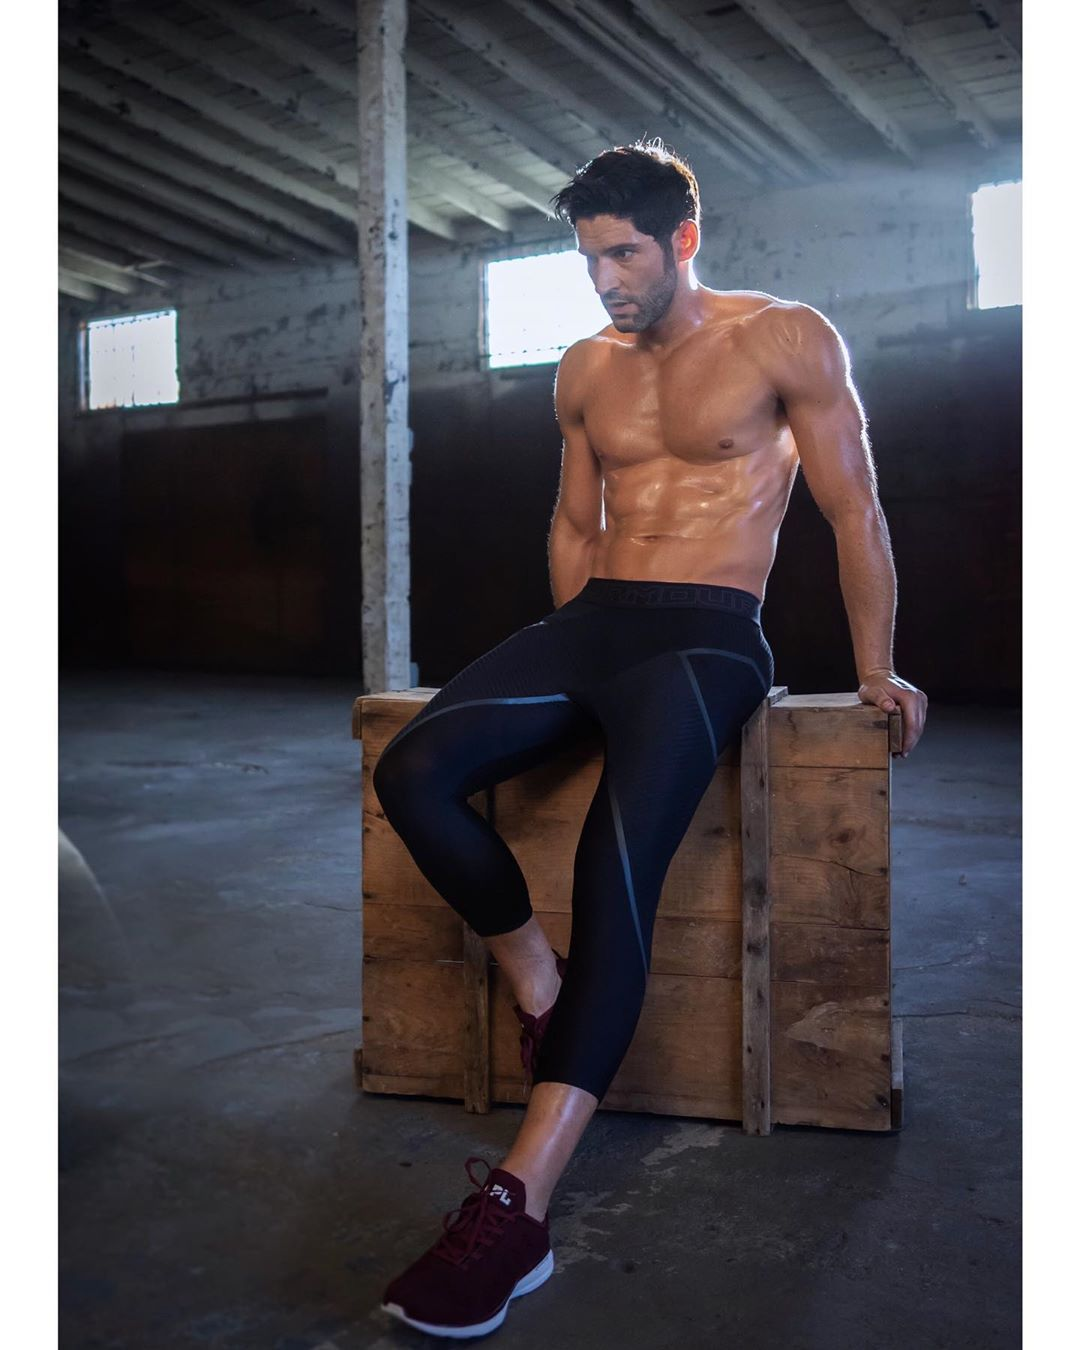 New Pictures Of Tom Ellis: BTS Men's Health Photoshoot